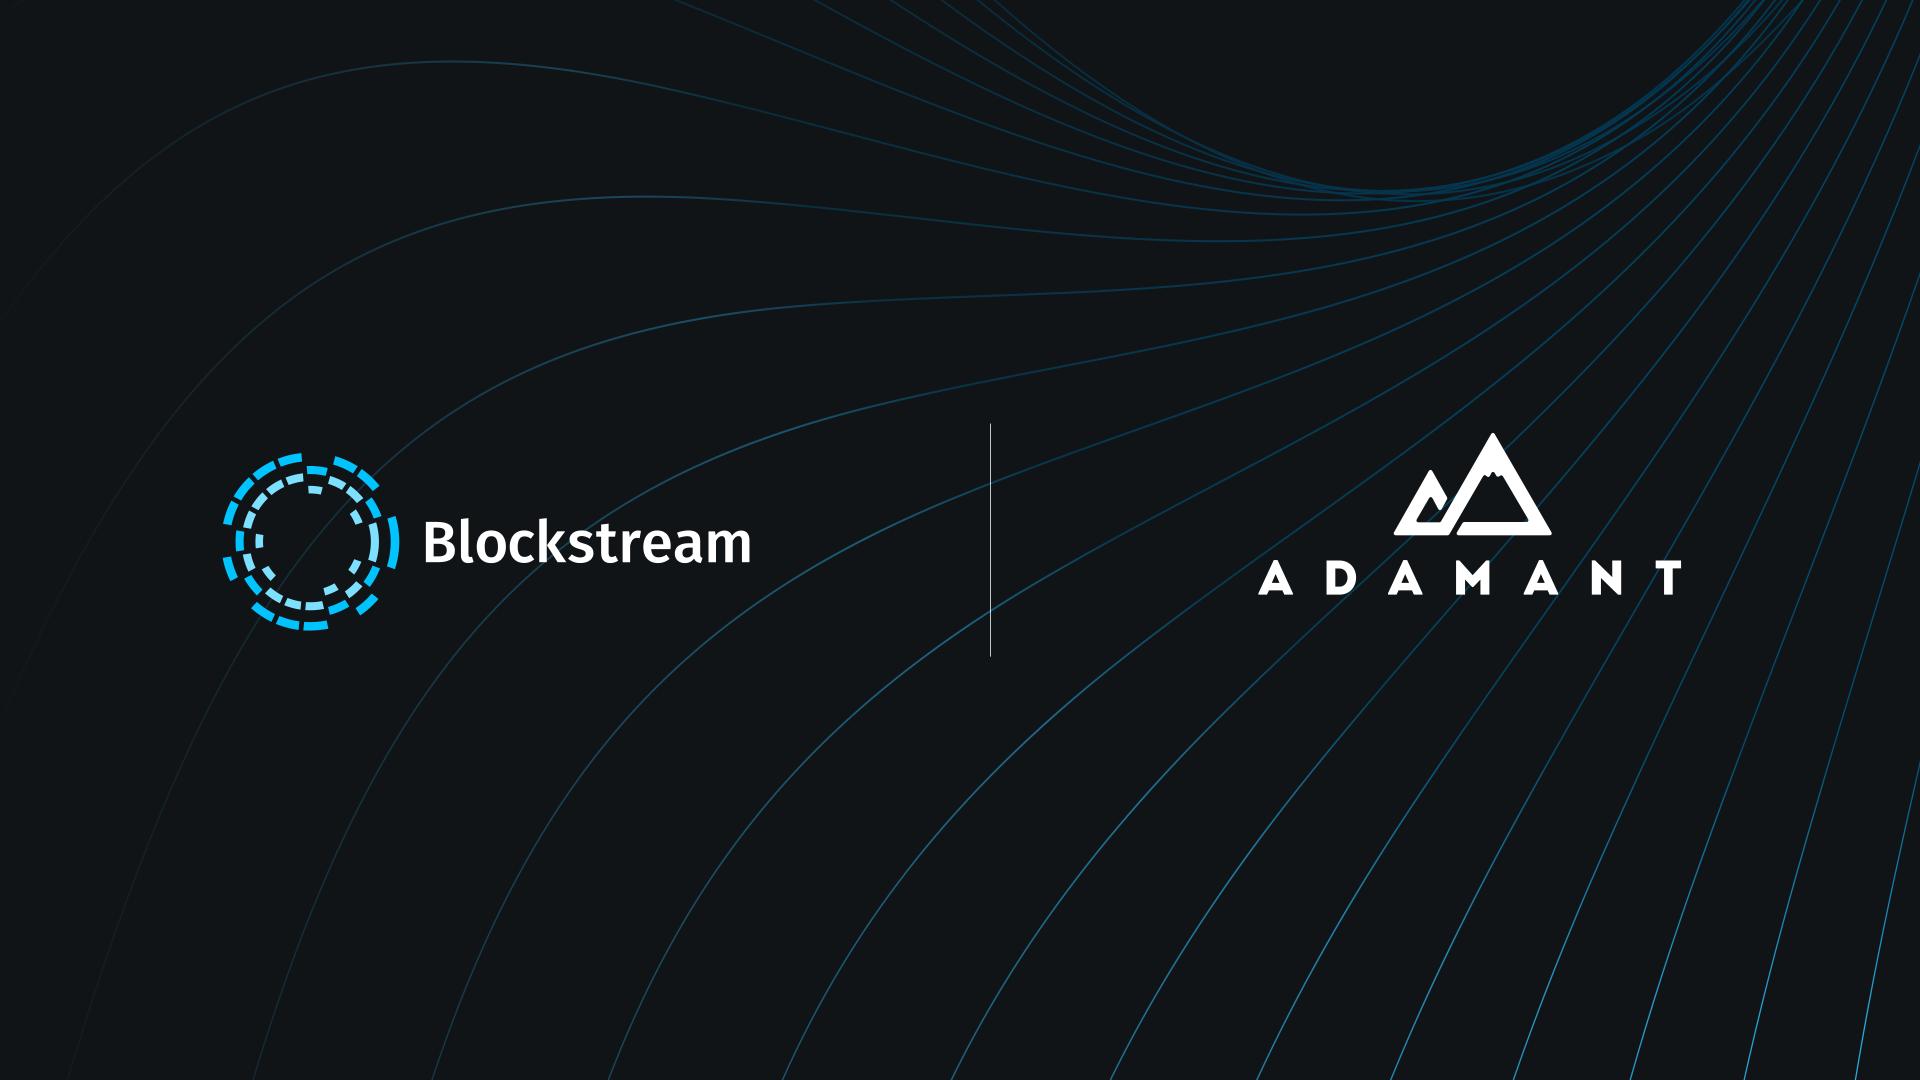 Blockstream Acquires Adamant Capital and Establishes Blockstream Finance